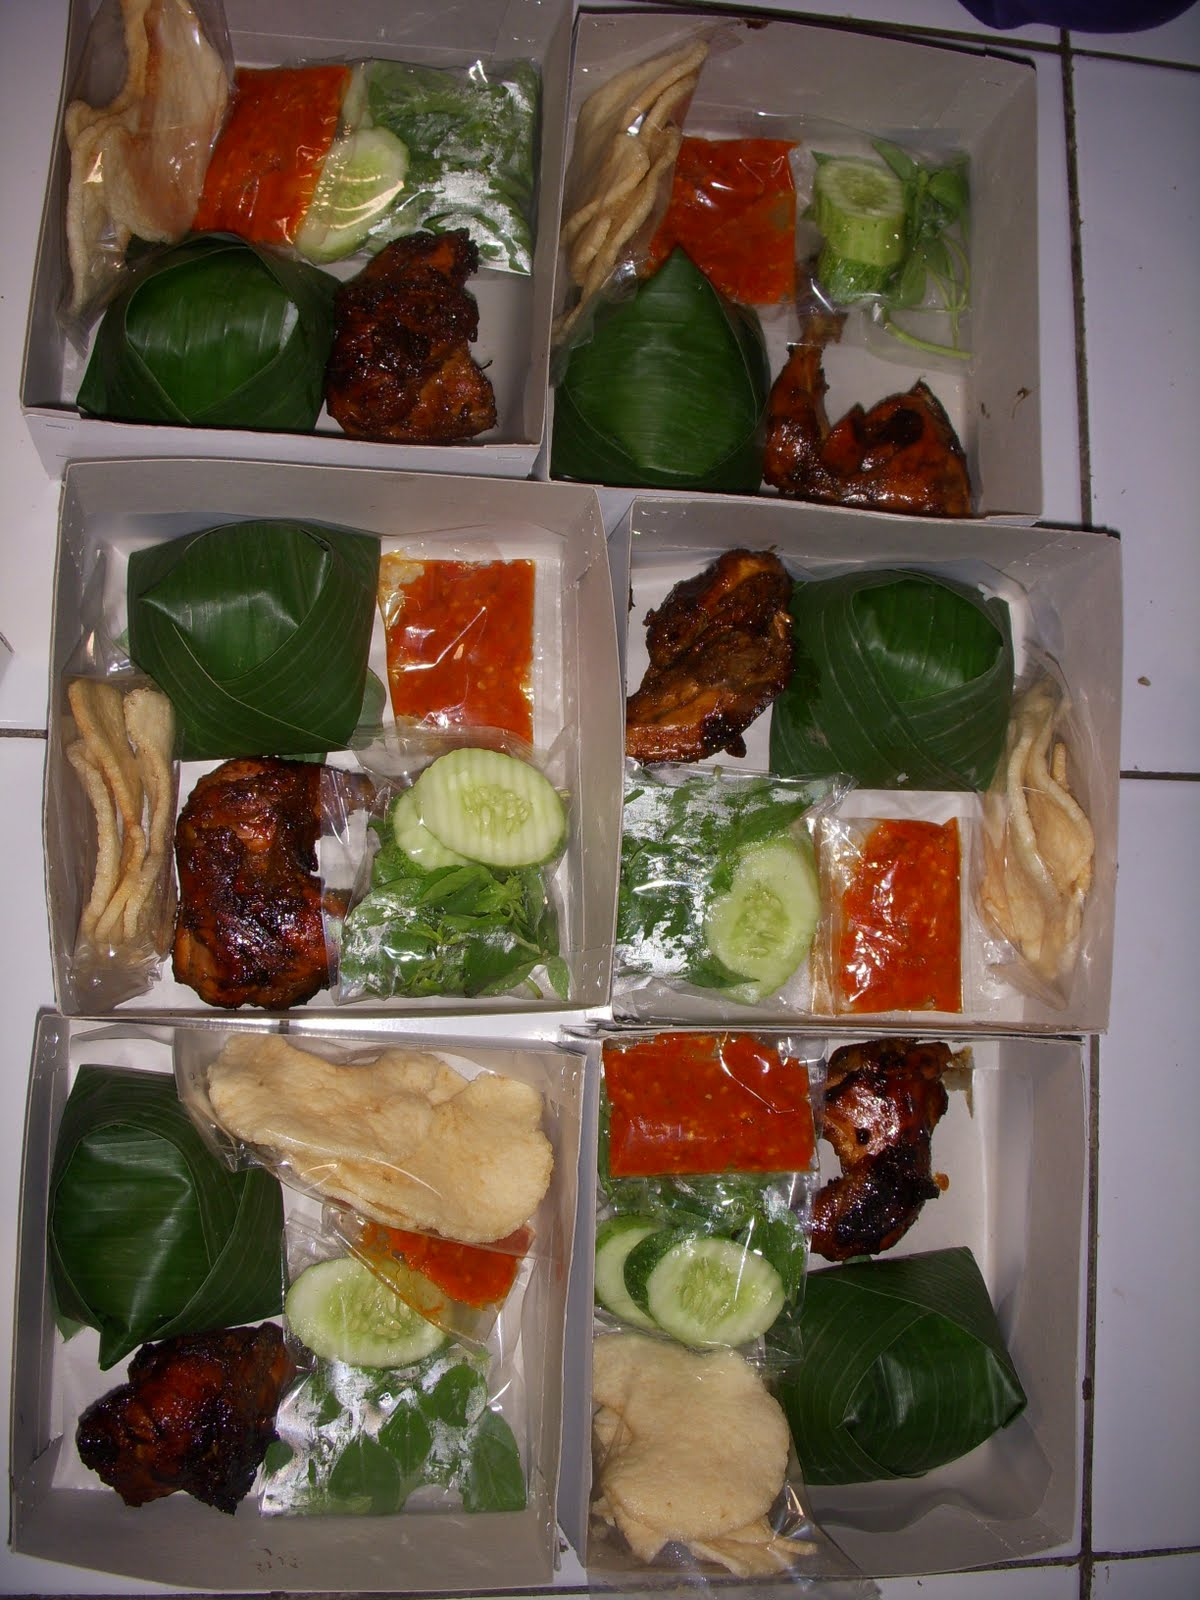 Paket Nasi Box Rp.28.000 - Devista Catering